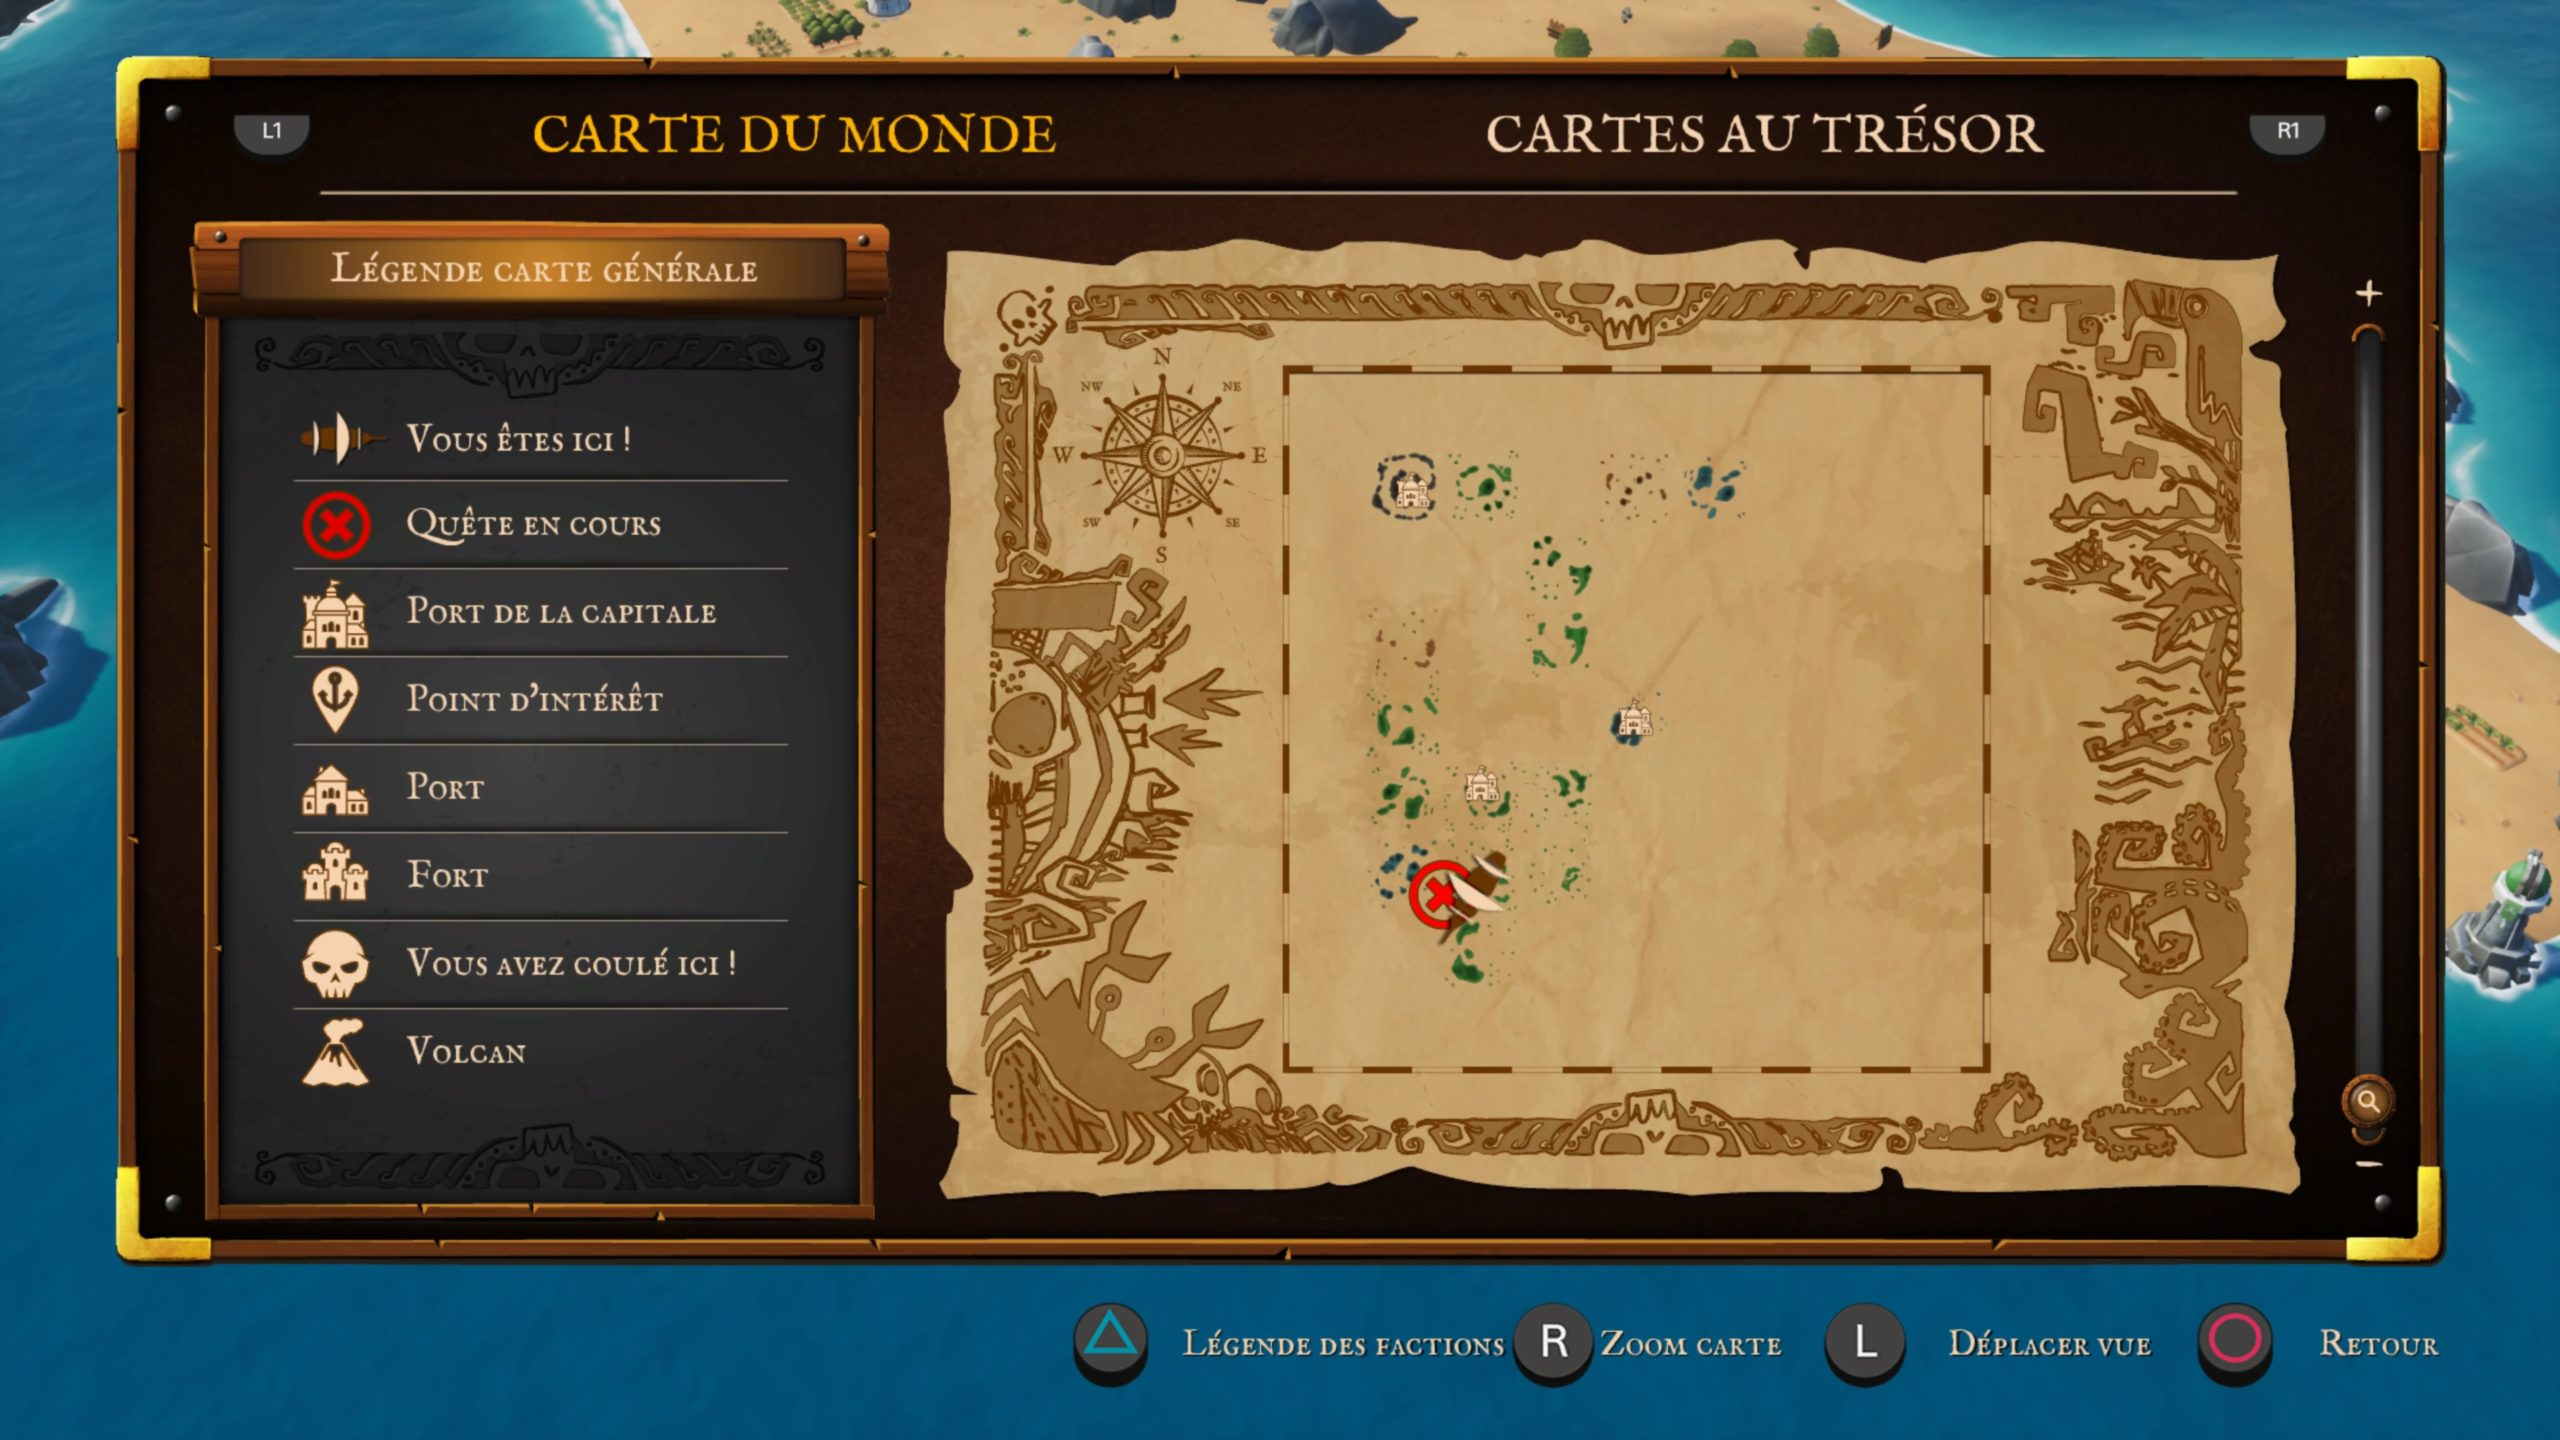 Carte du monde dans King of Seas